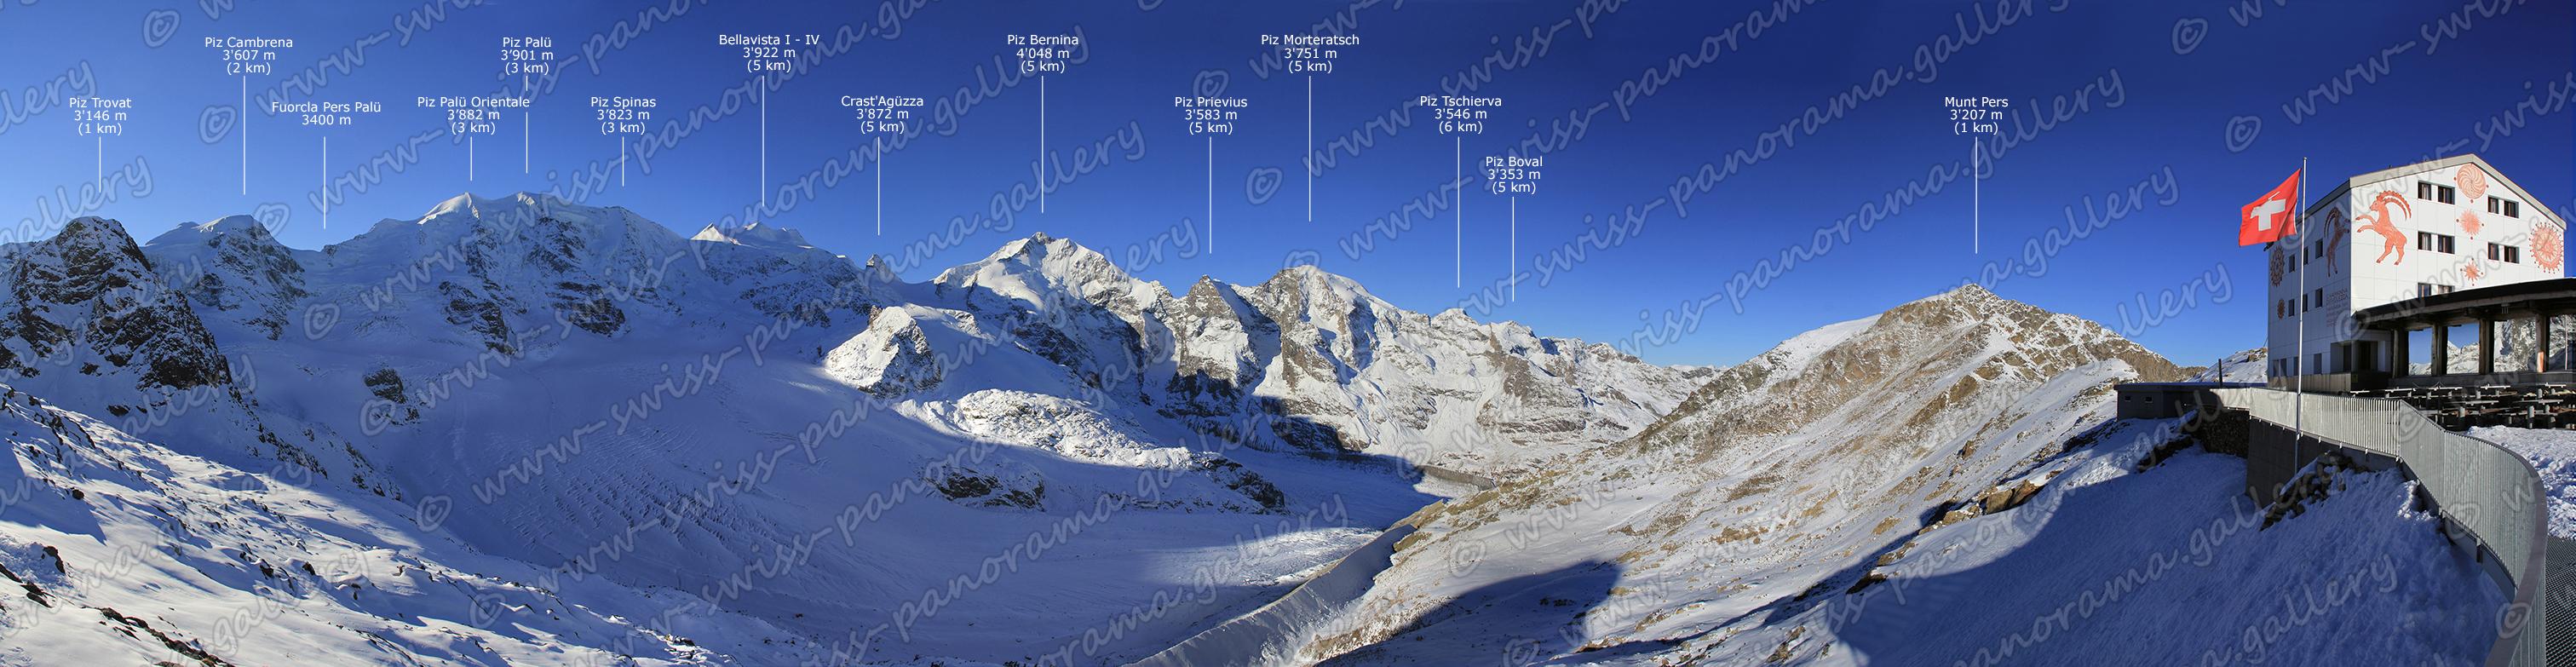 https://www.mountainstamp.com/Switzerland_Panoramas_images/Diavolezza_panorama_A.jpg